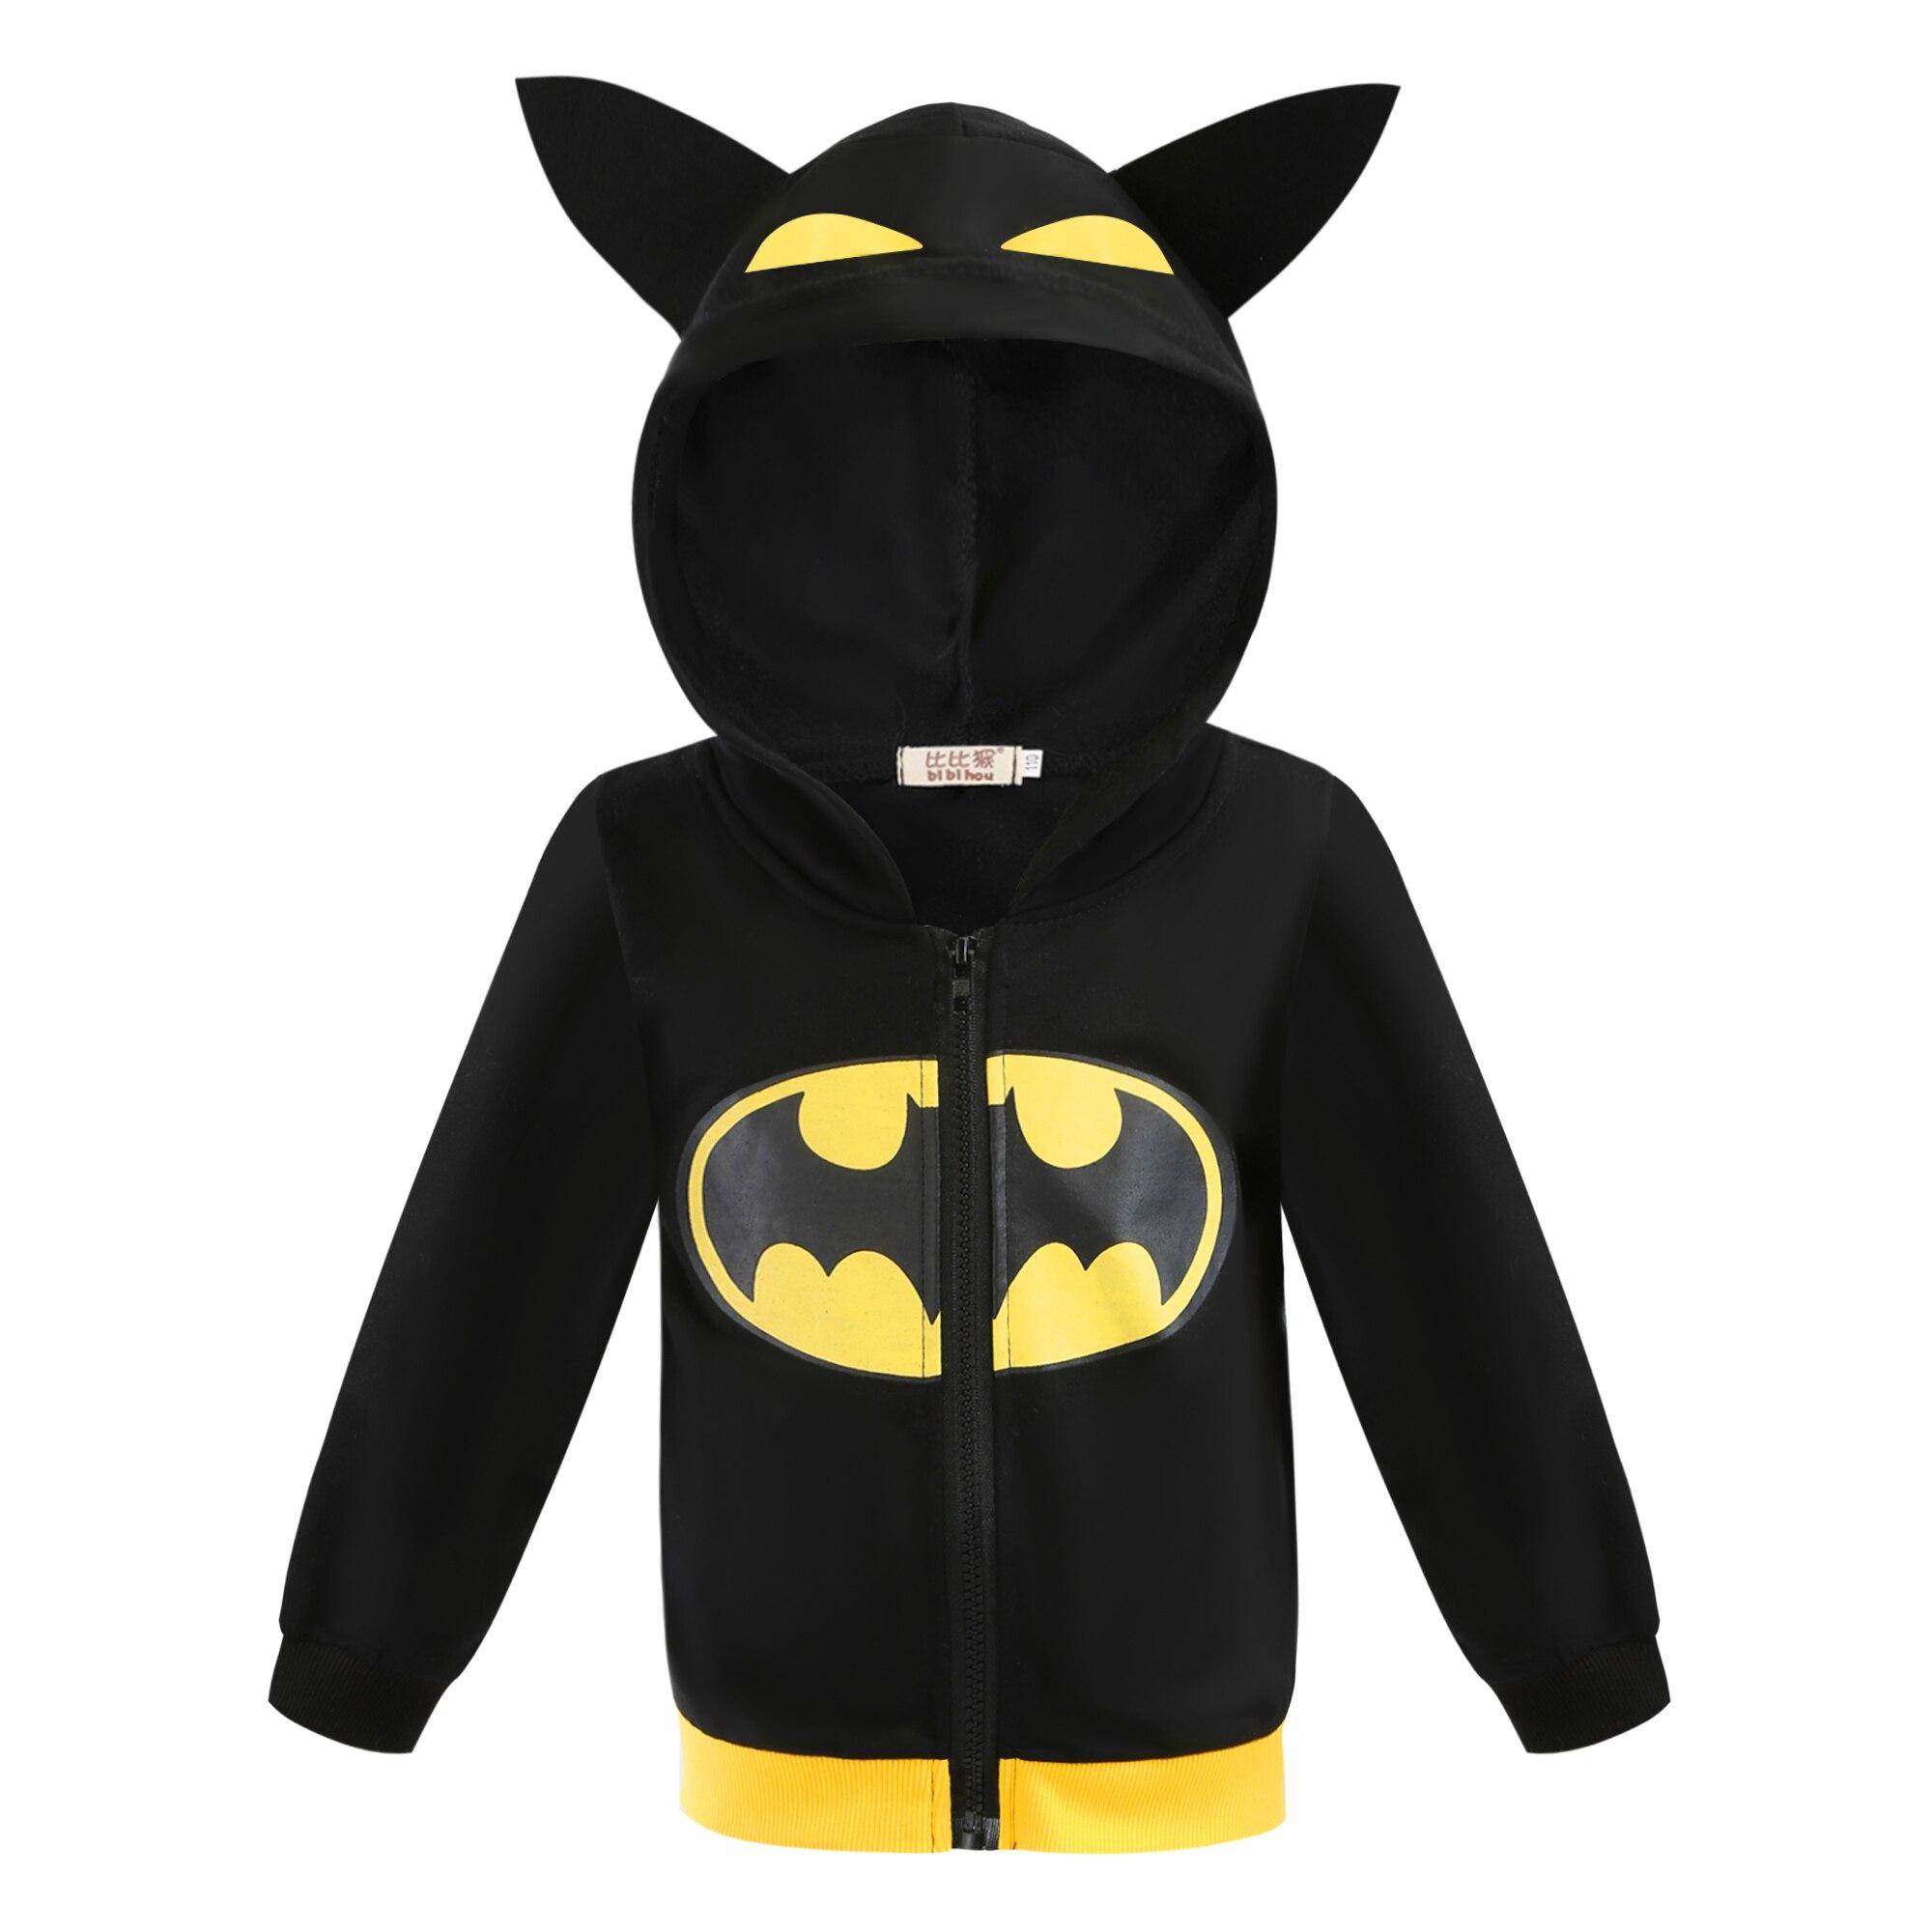 Frühling Herbst Batman mantel Ninja Schildkröte Hoodies kinder Jacke Spider-Man Captain America Jungen Zipper Jacke Jungen Kleidung